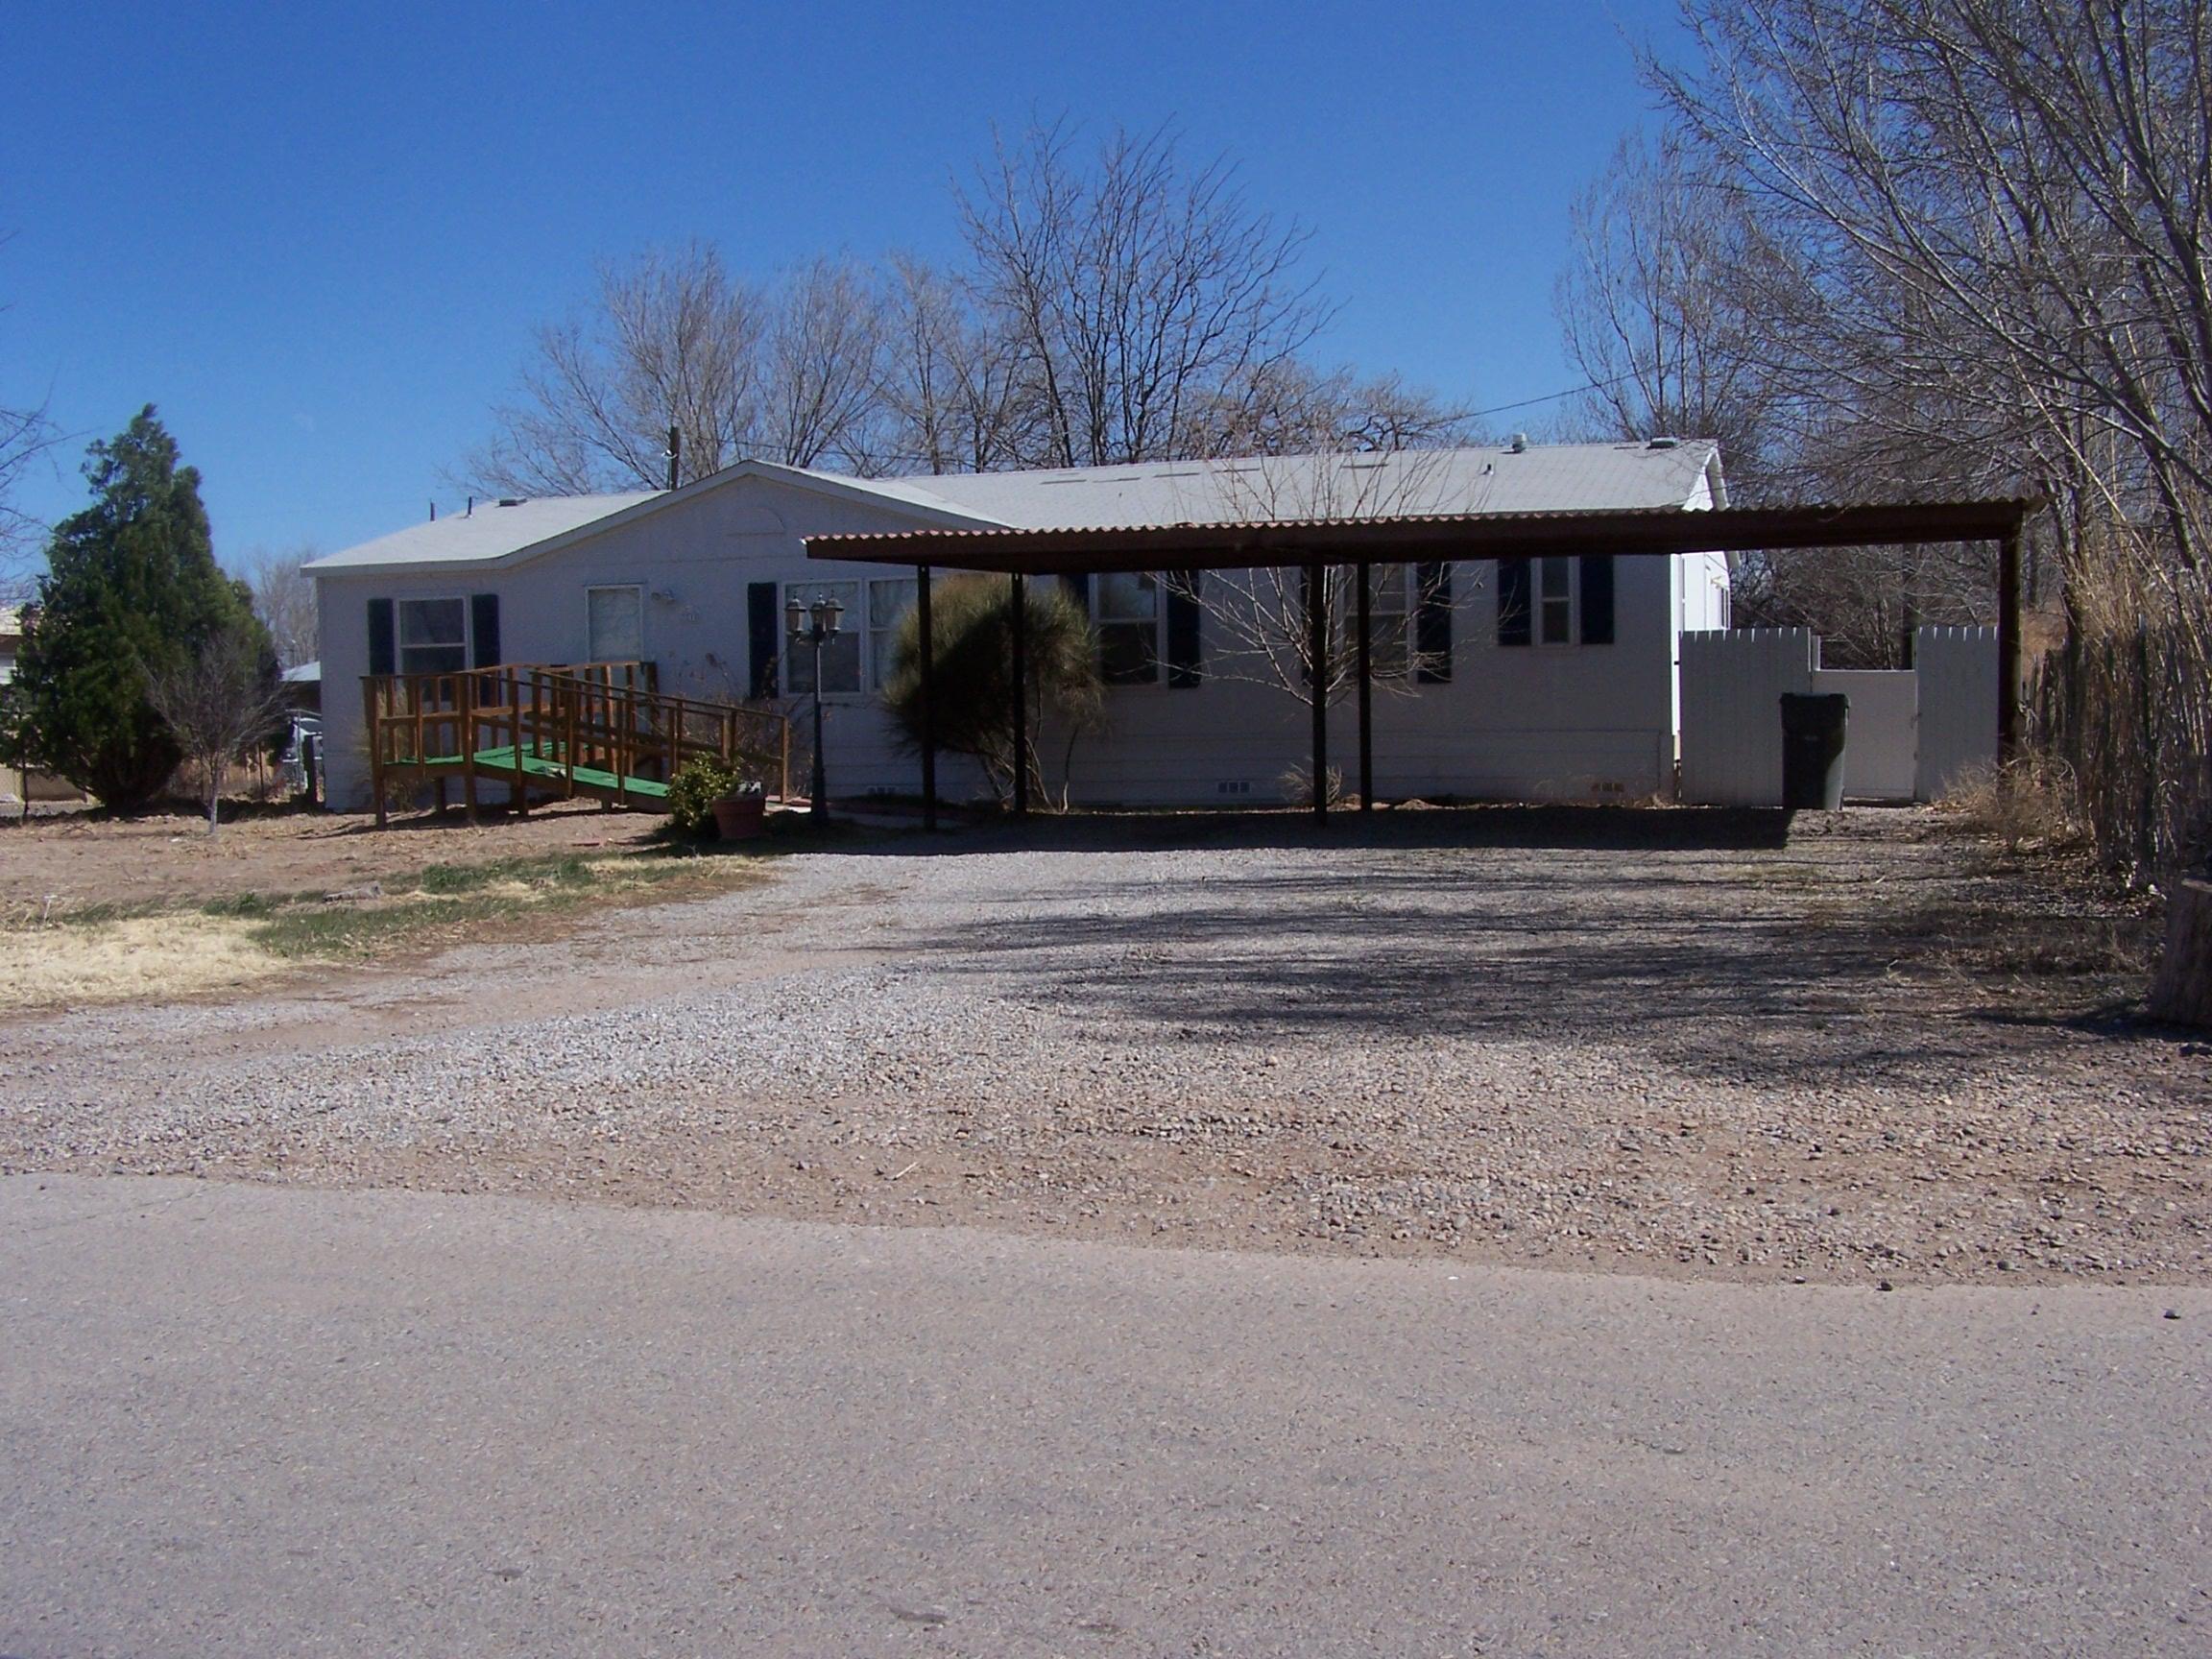 2810 PARKLANE Drive Property Photo - Bosque Farms, NM real estate listing